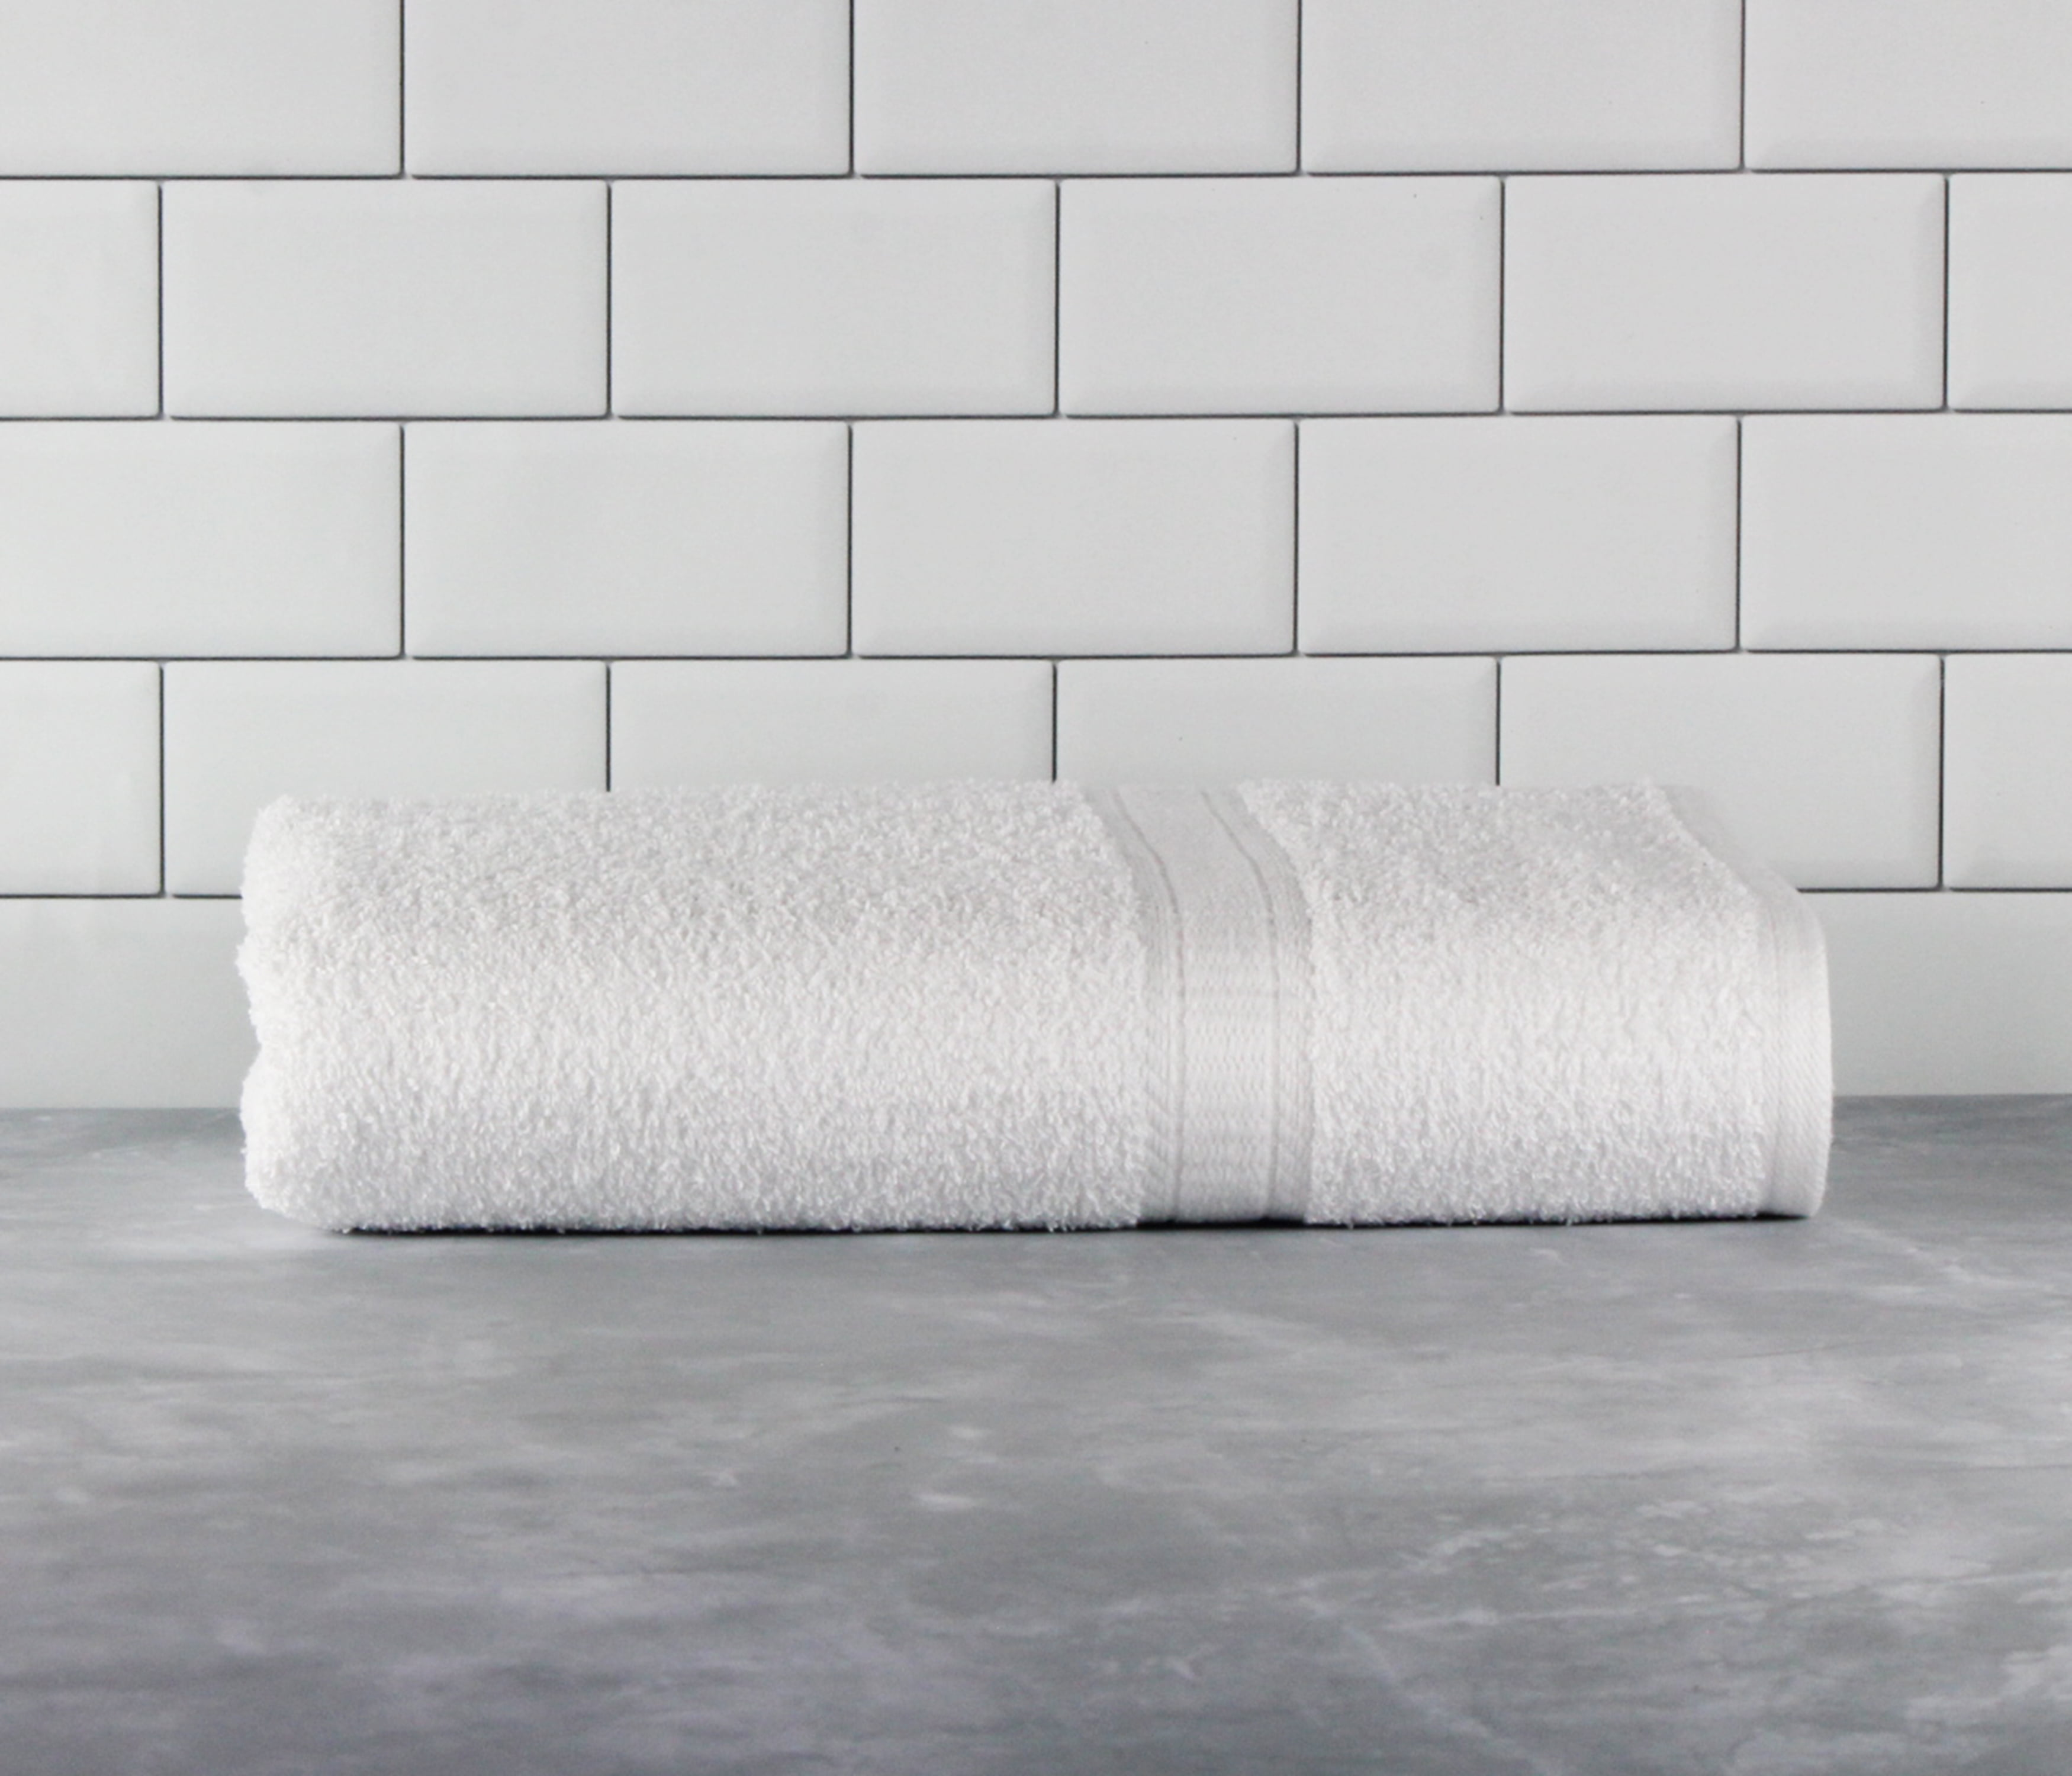 Details about  /Valtellina 140 GSM Cotton Bath towel 1 piece , White -2o1